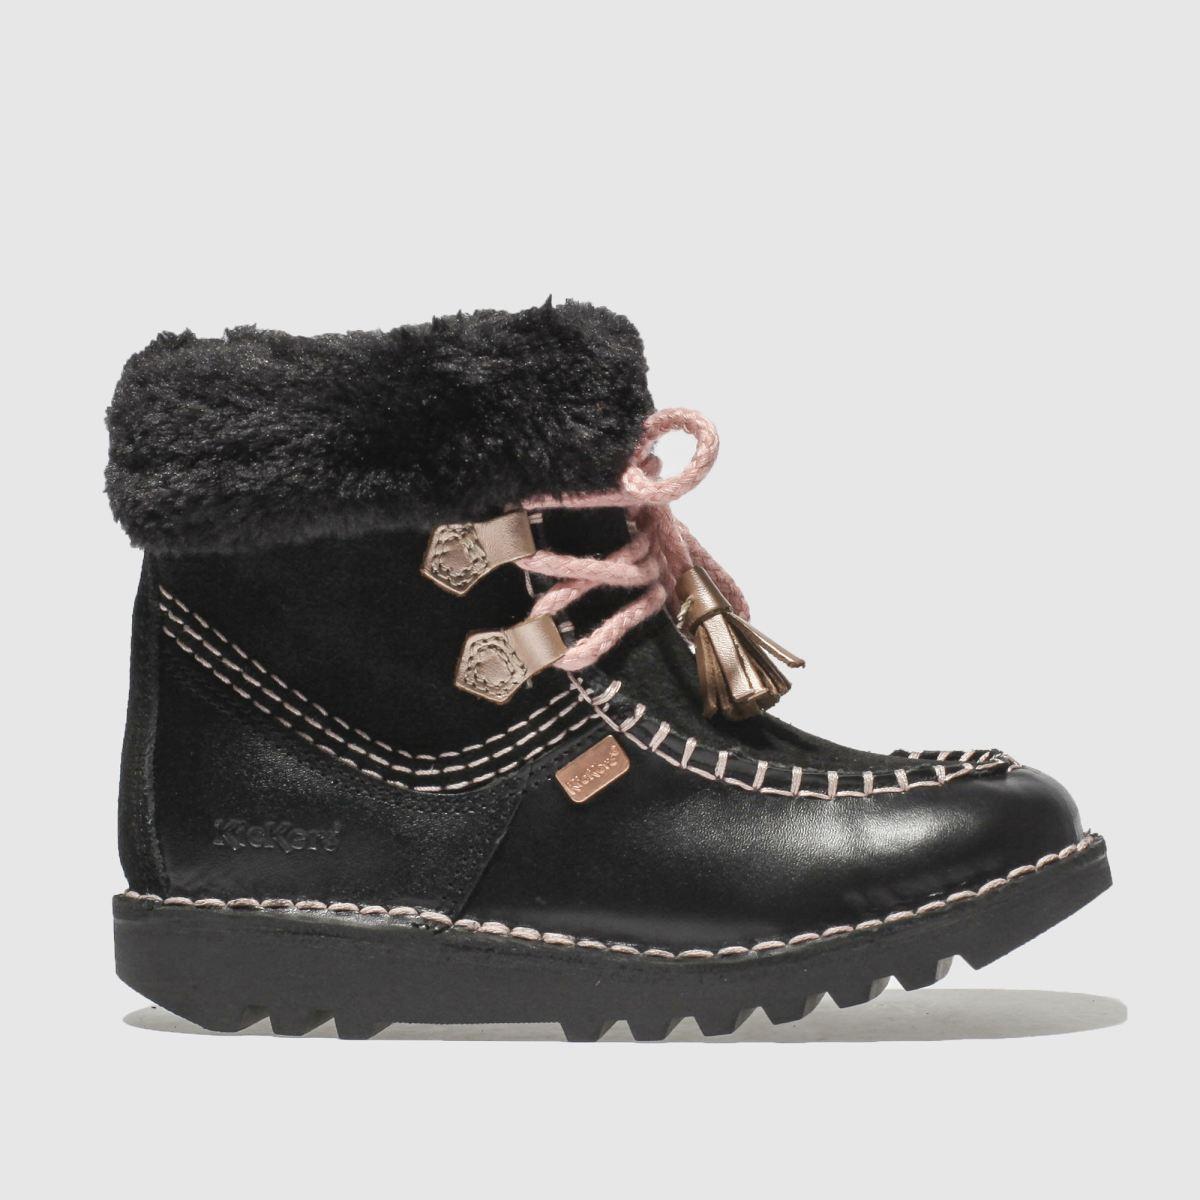 Kickers Black & Pink Fur Wallee Boots Toddler